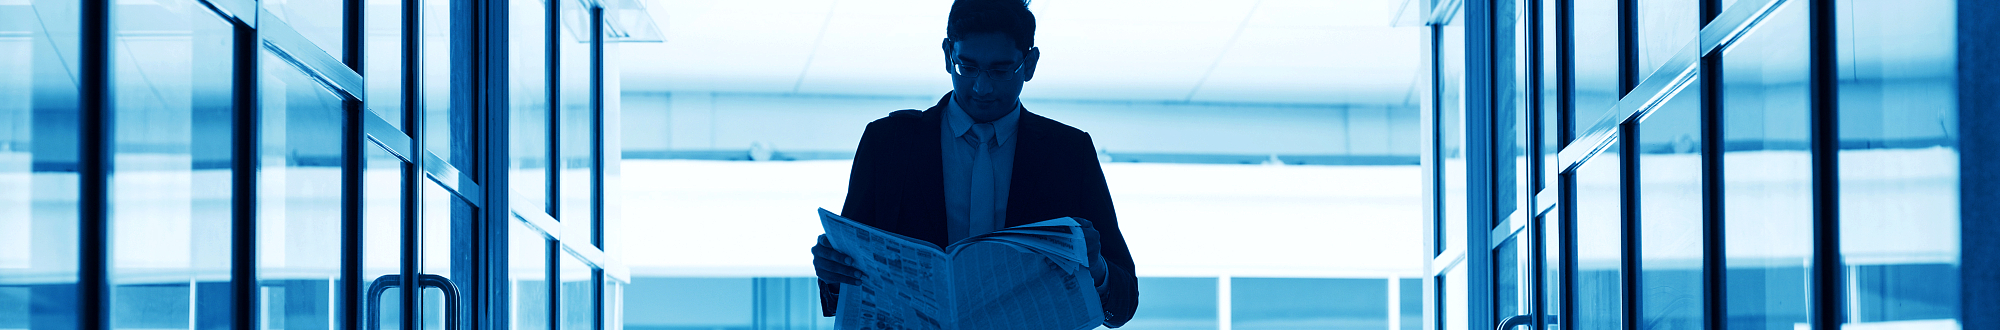 man reading a news